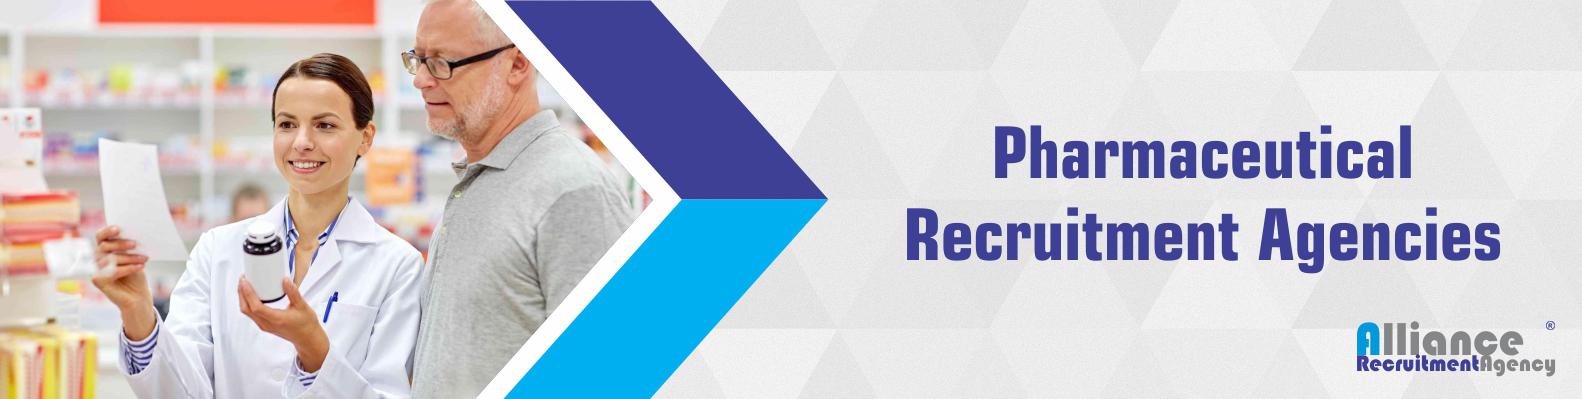 Pharmaceutical Recruitment Agencies - Top Pharma Consulting Companie